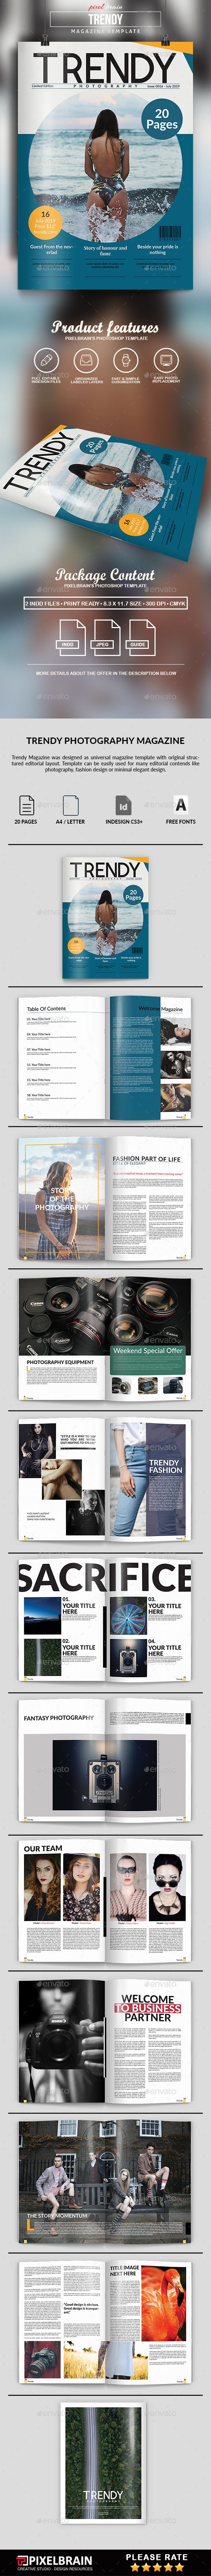 Trendy Magazine — InDesign INDD #simple magazine #design magazine • Download ➝ https://graphicriver.net/item/trendy-magazine/18834346?ref=pxcr